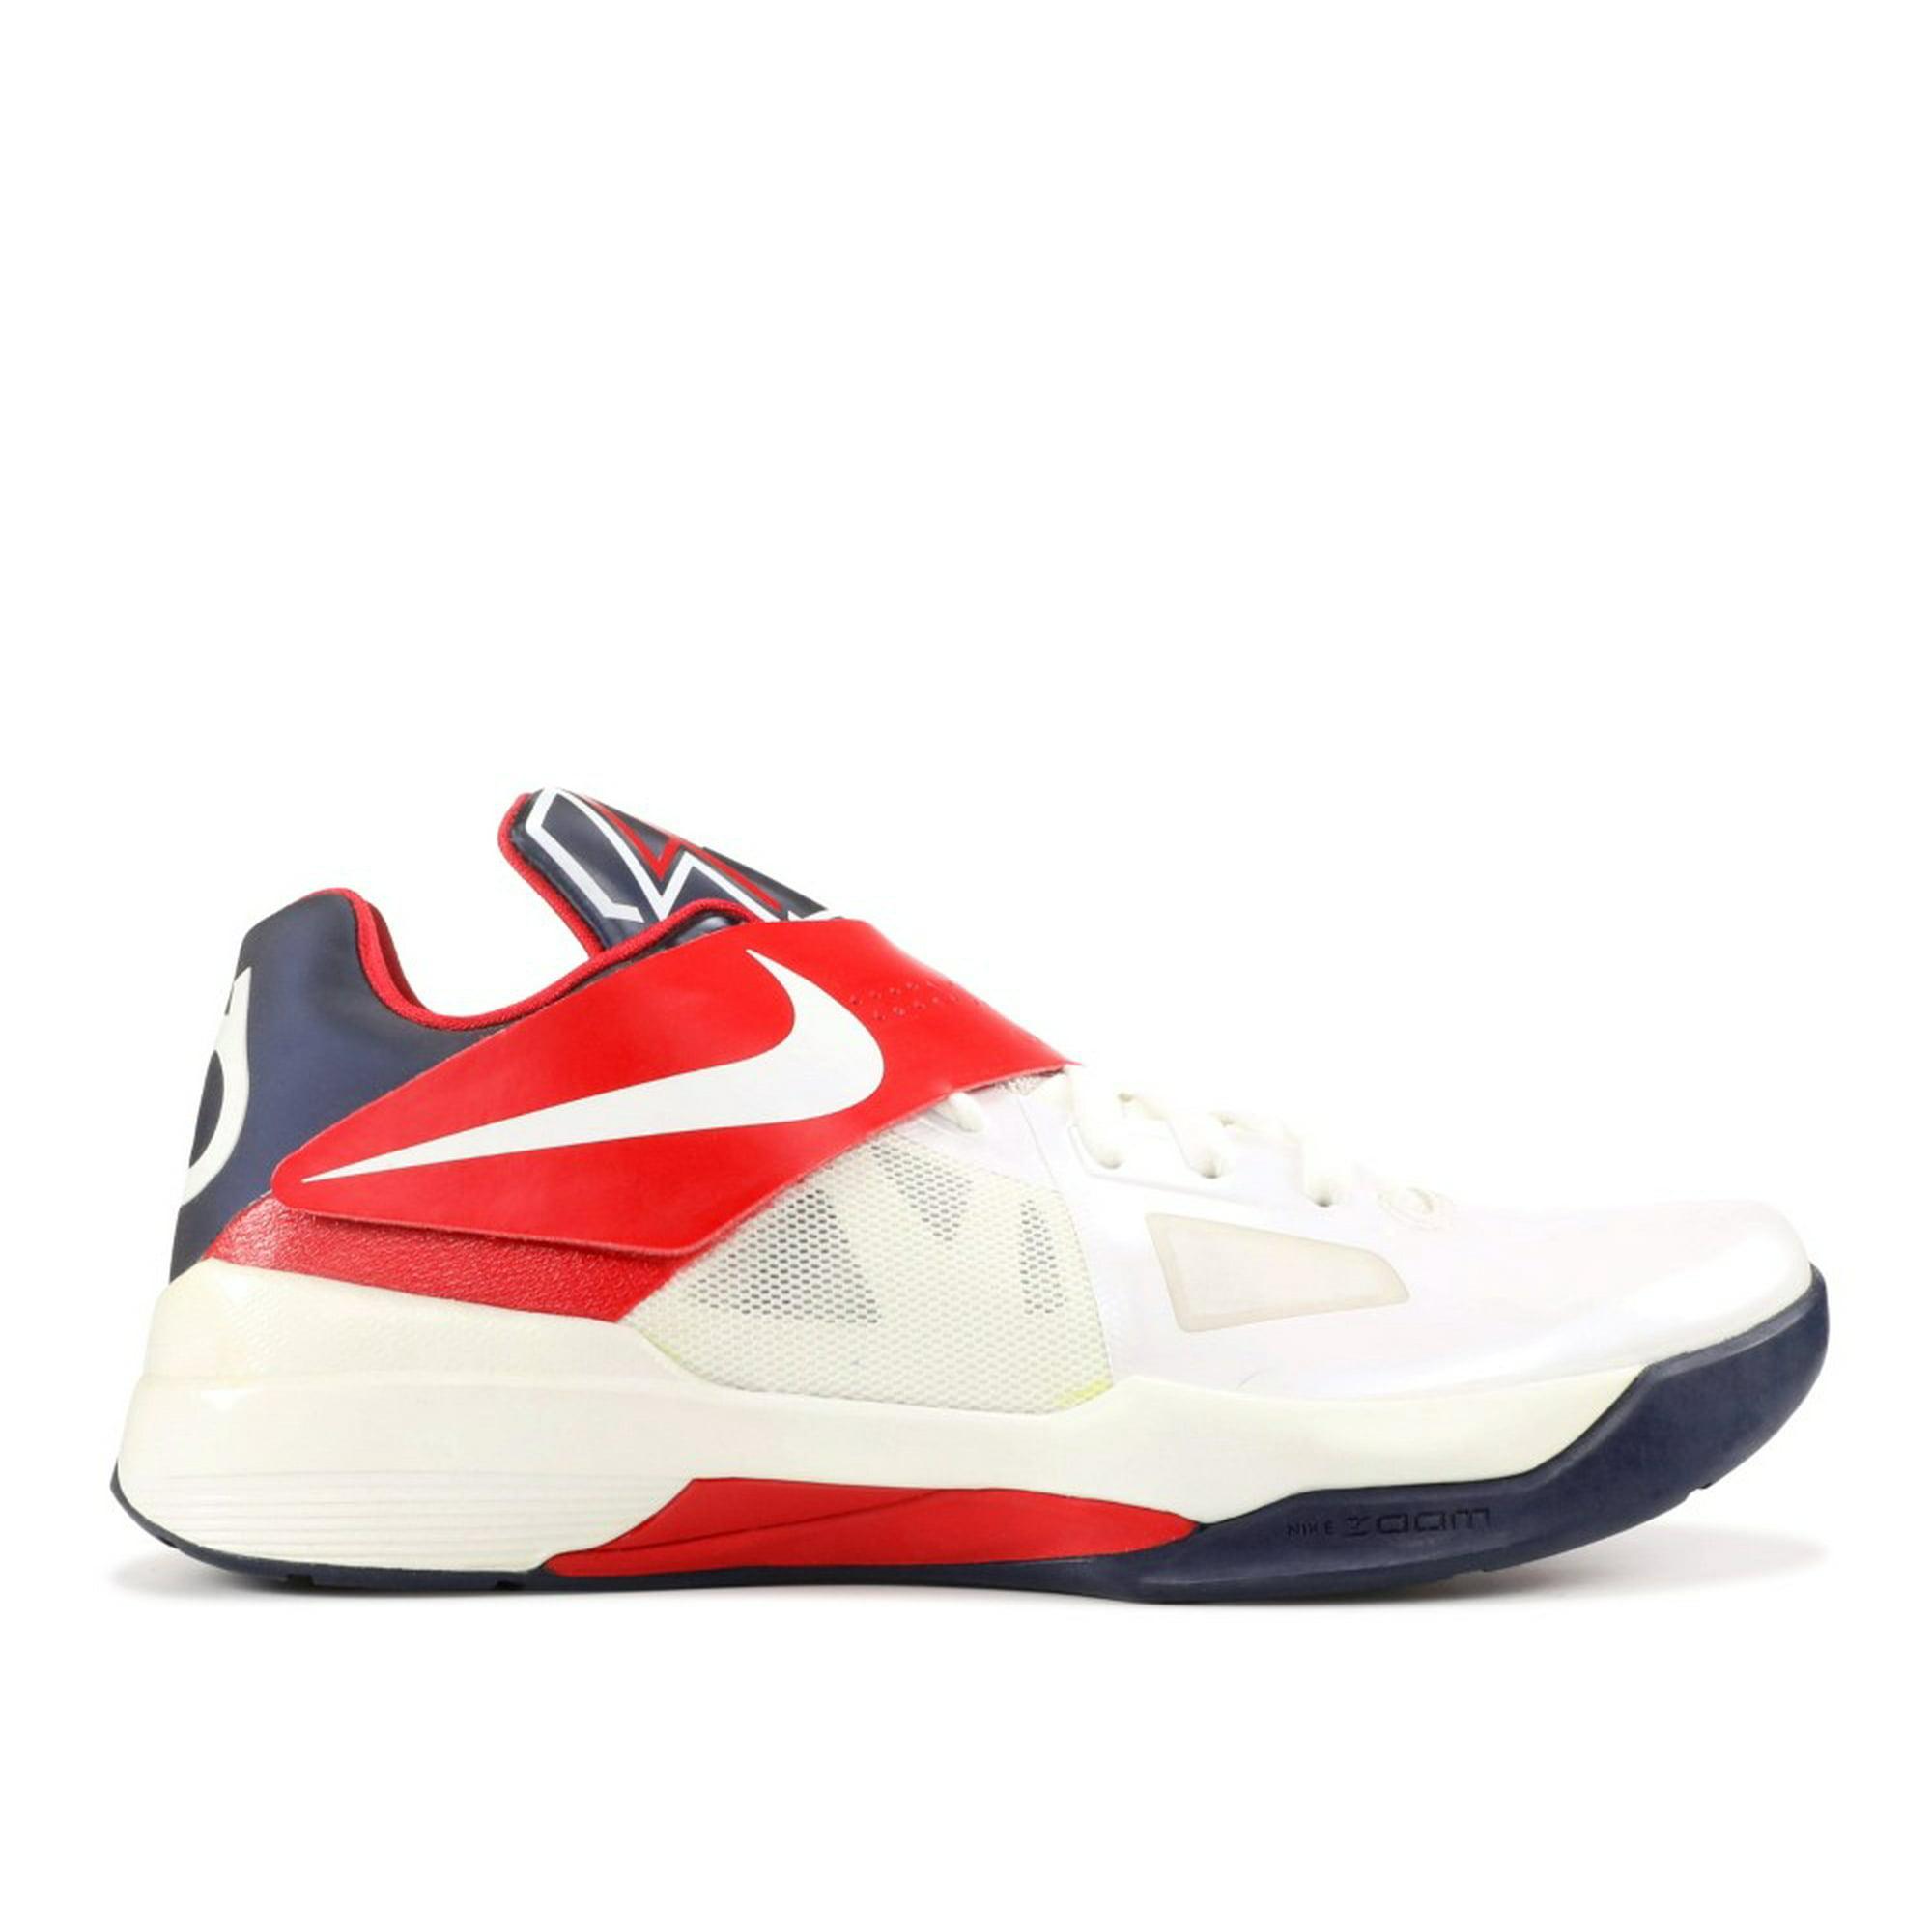 7bcd4fc71e90 Nike - Men - Zoom Kd 4  Usa  - 473679-103 - Size 10.5